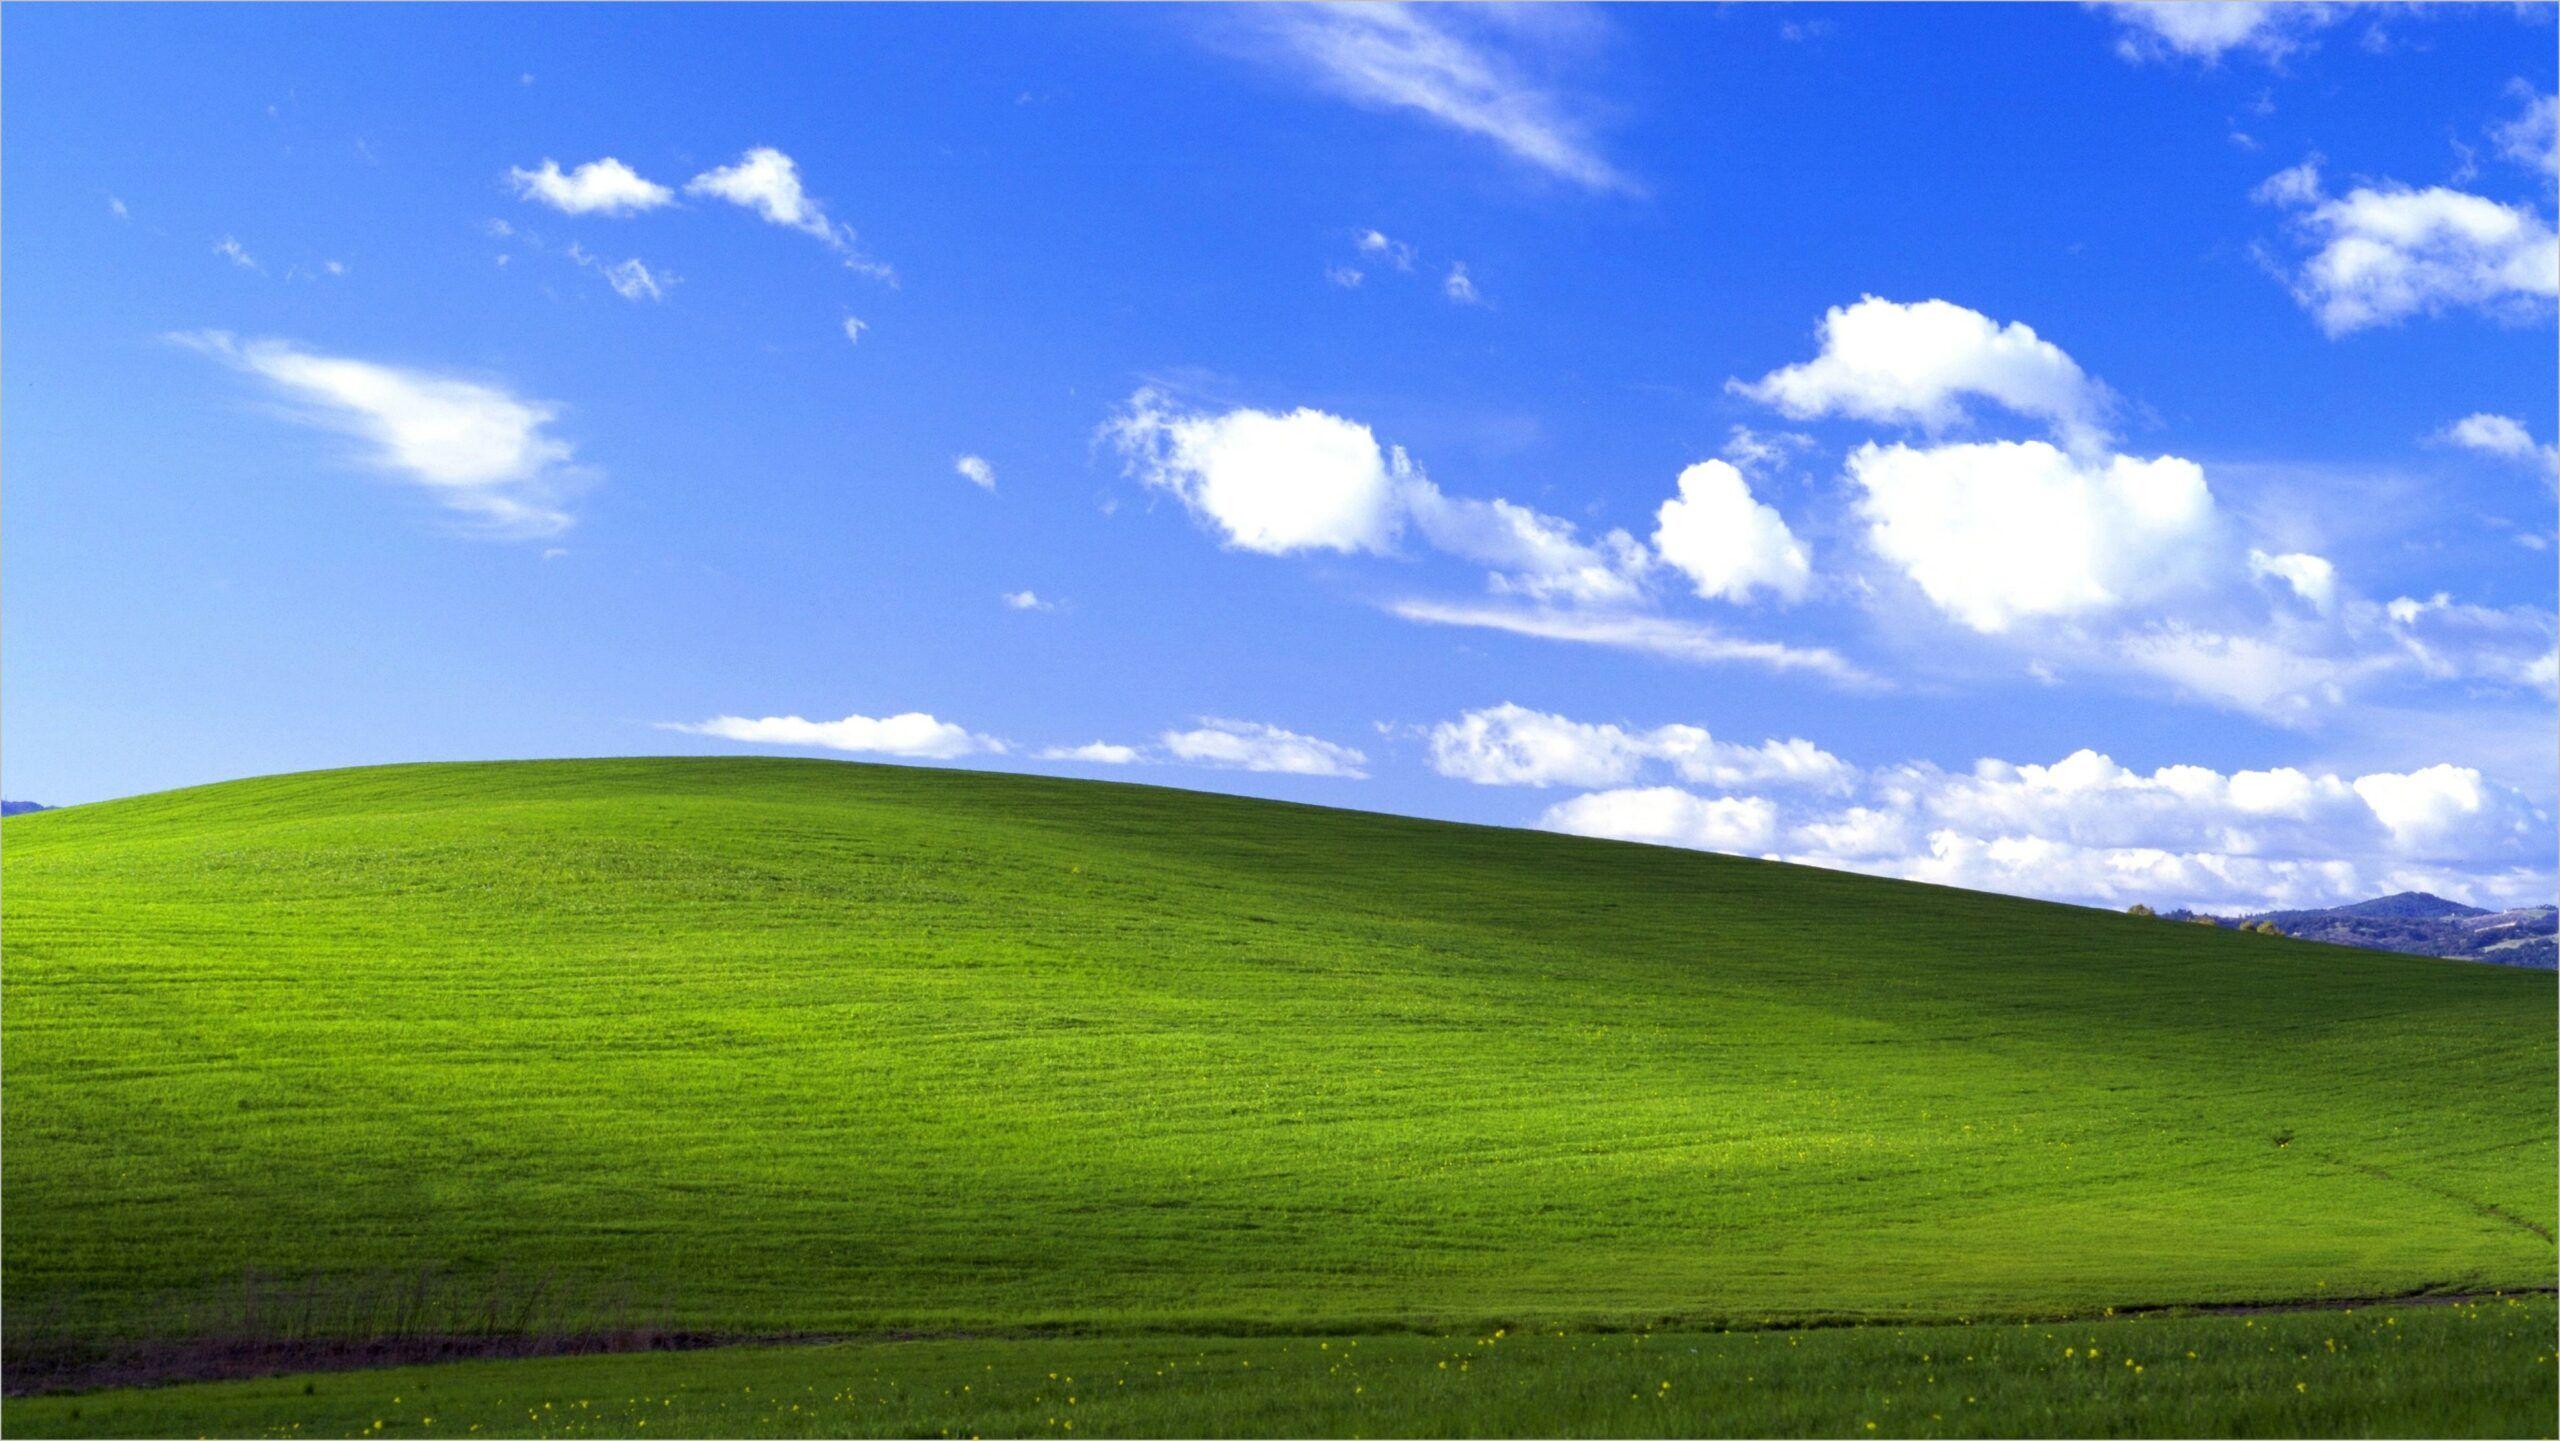 Azul 4k Wallpaper Windows Xp In 2020 Windows Xp Windows Wallpaper Backgrounds Desktop